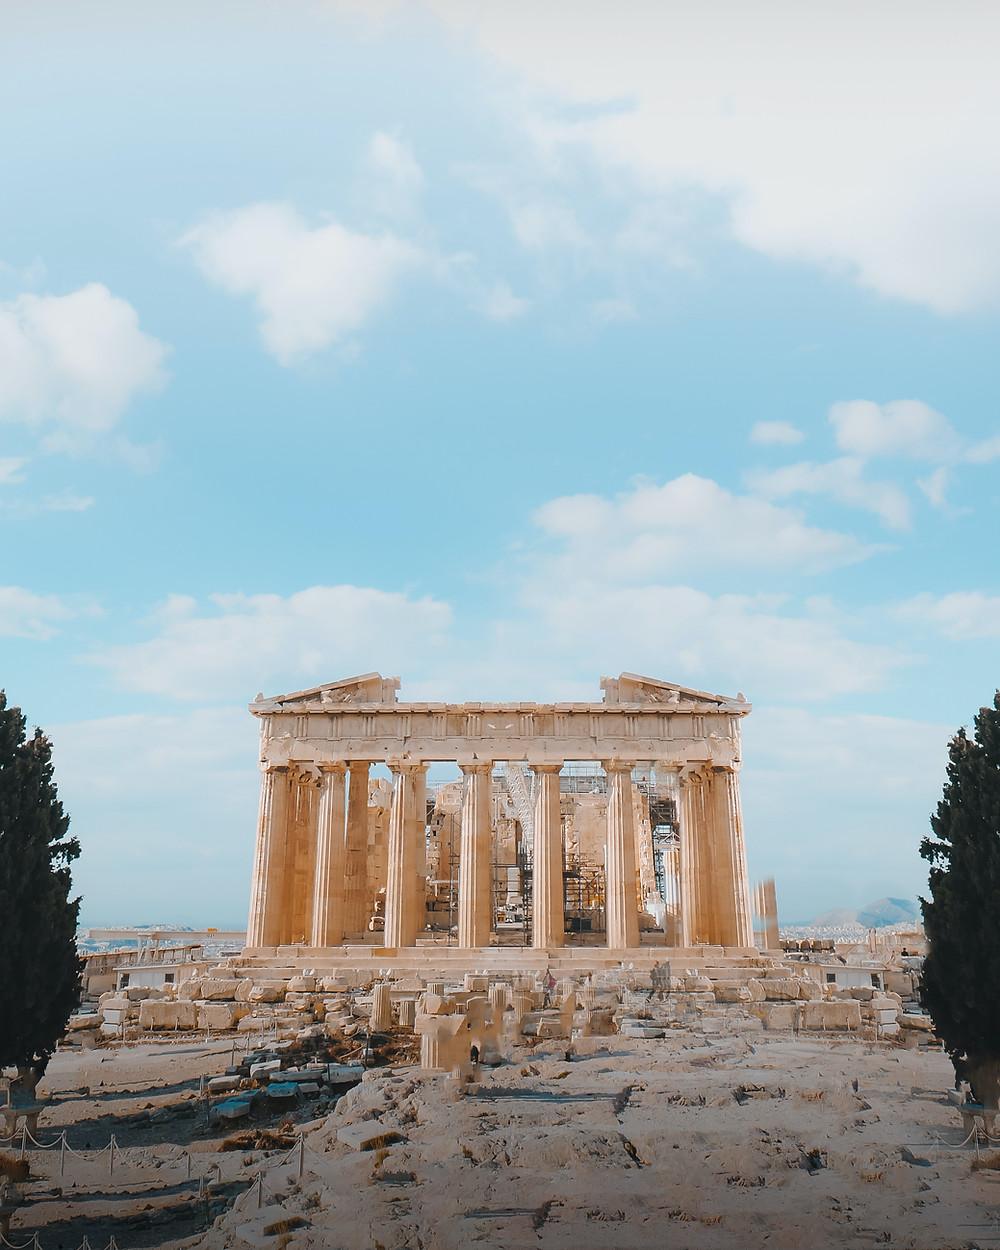 the Parthenon, side view